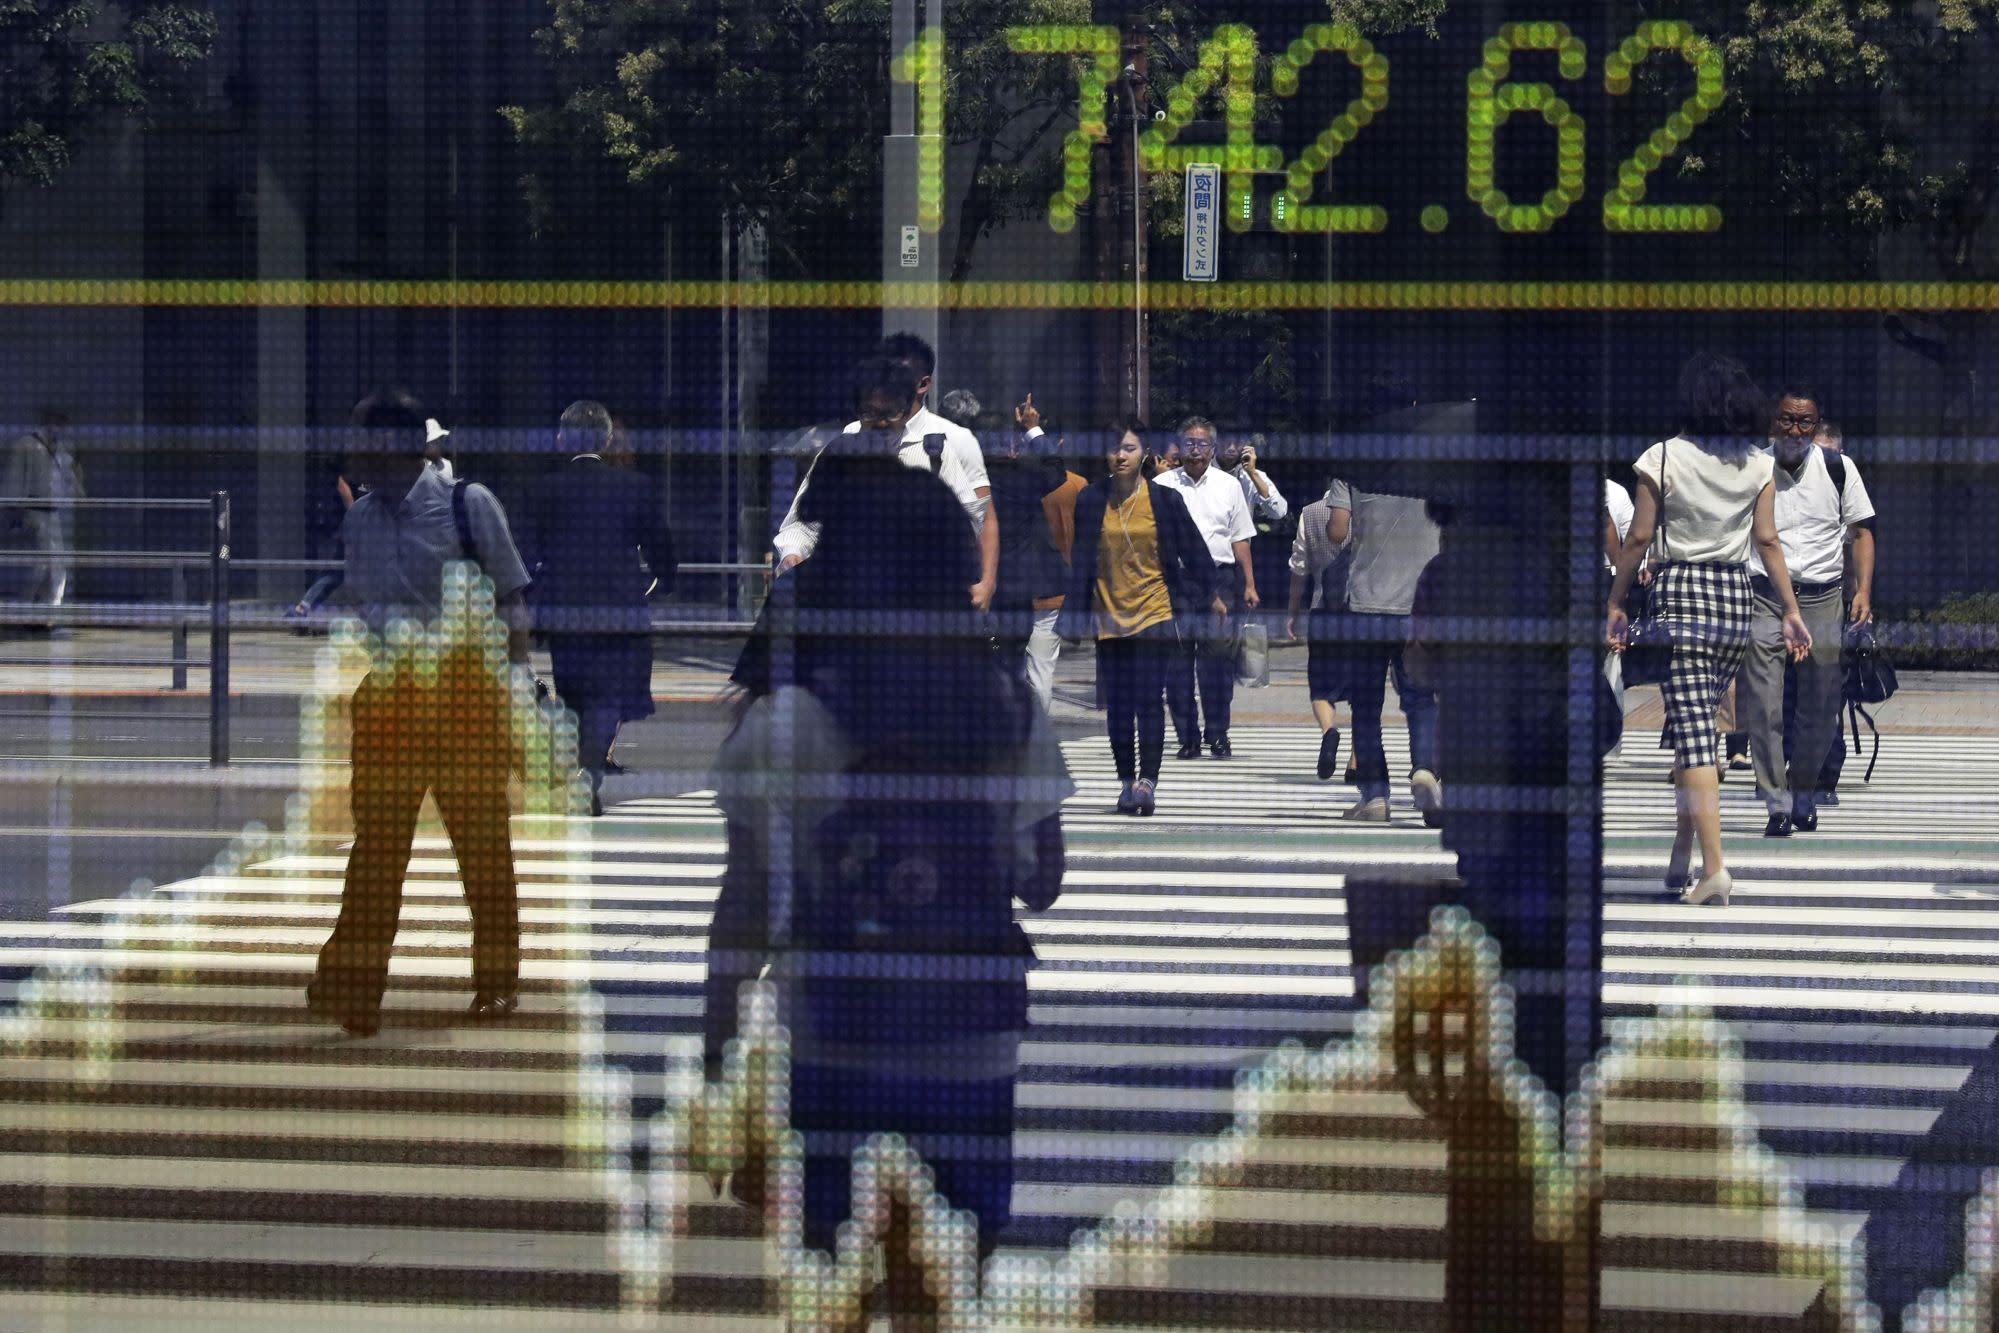 Stocks Slide to Extend to Asia as Treasuries Rally: Markets Wrap